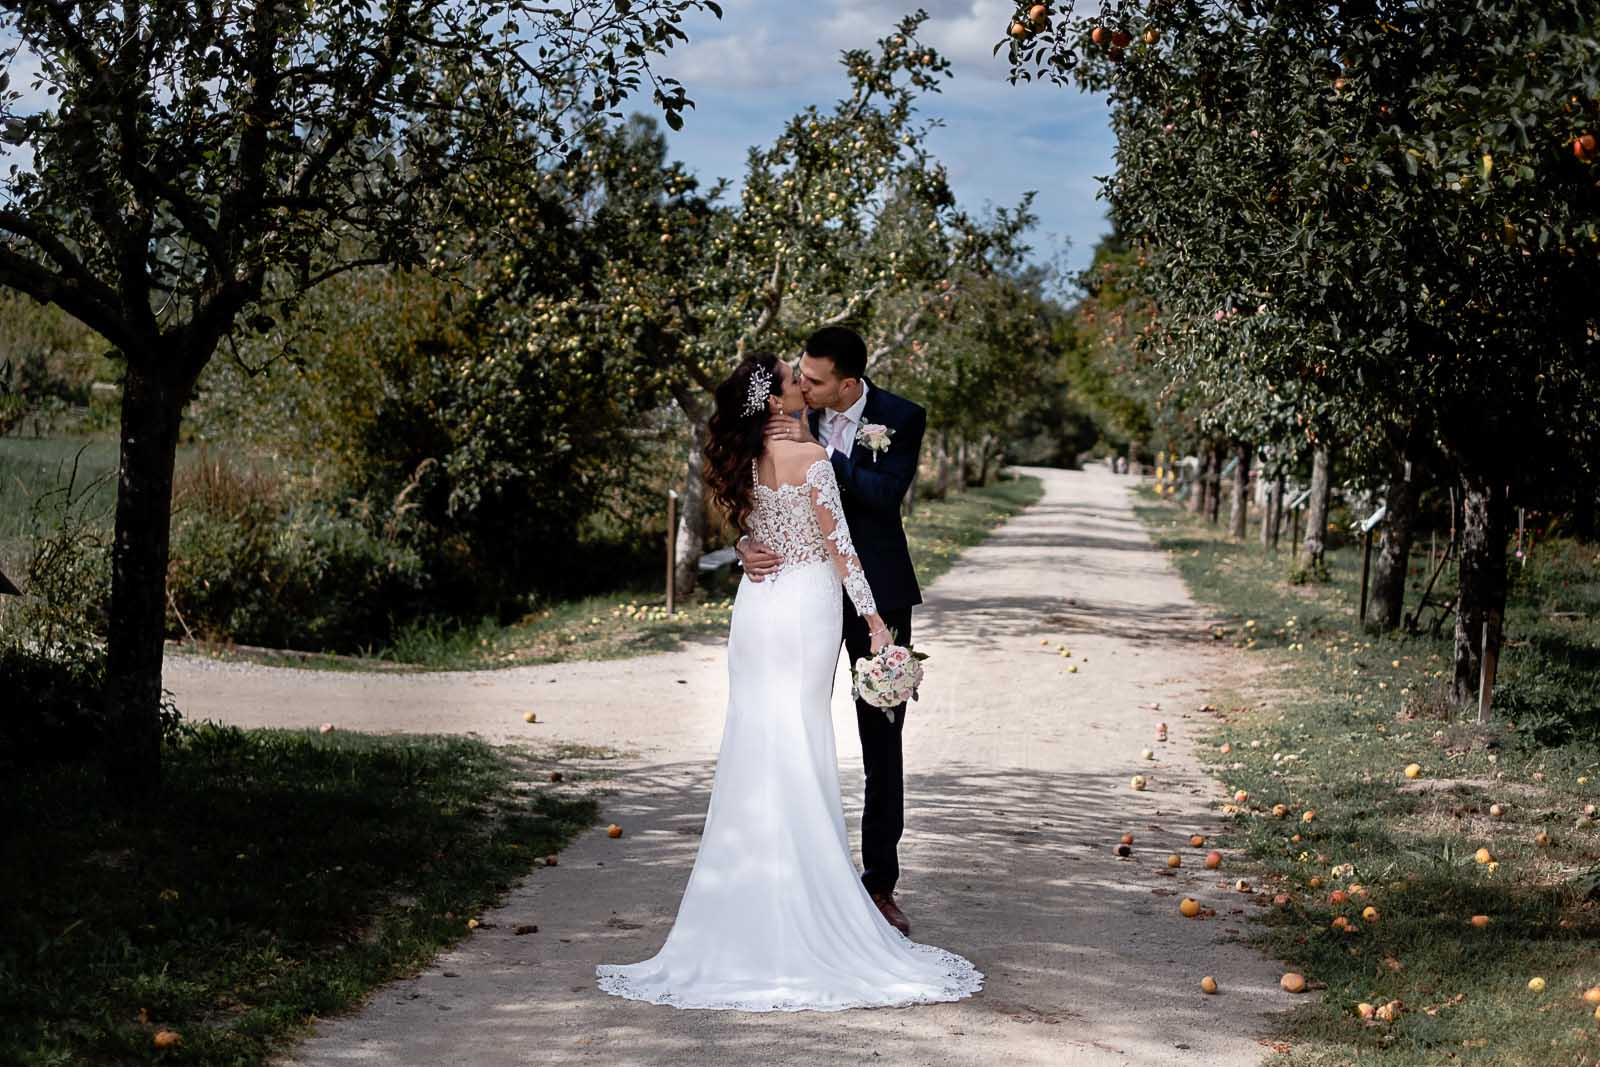 mathilde-arnaud-ecomuseee-alsace-photographe-mariage-professionnel-thann-mulhouse